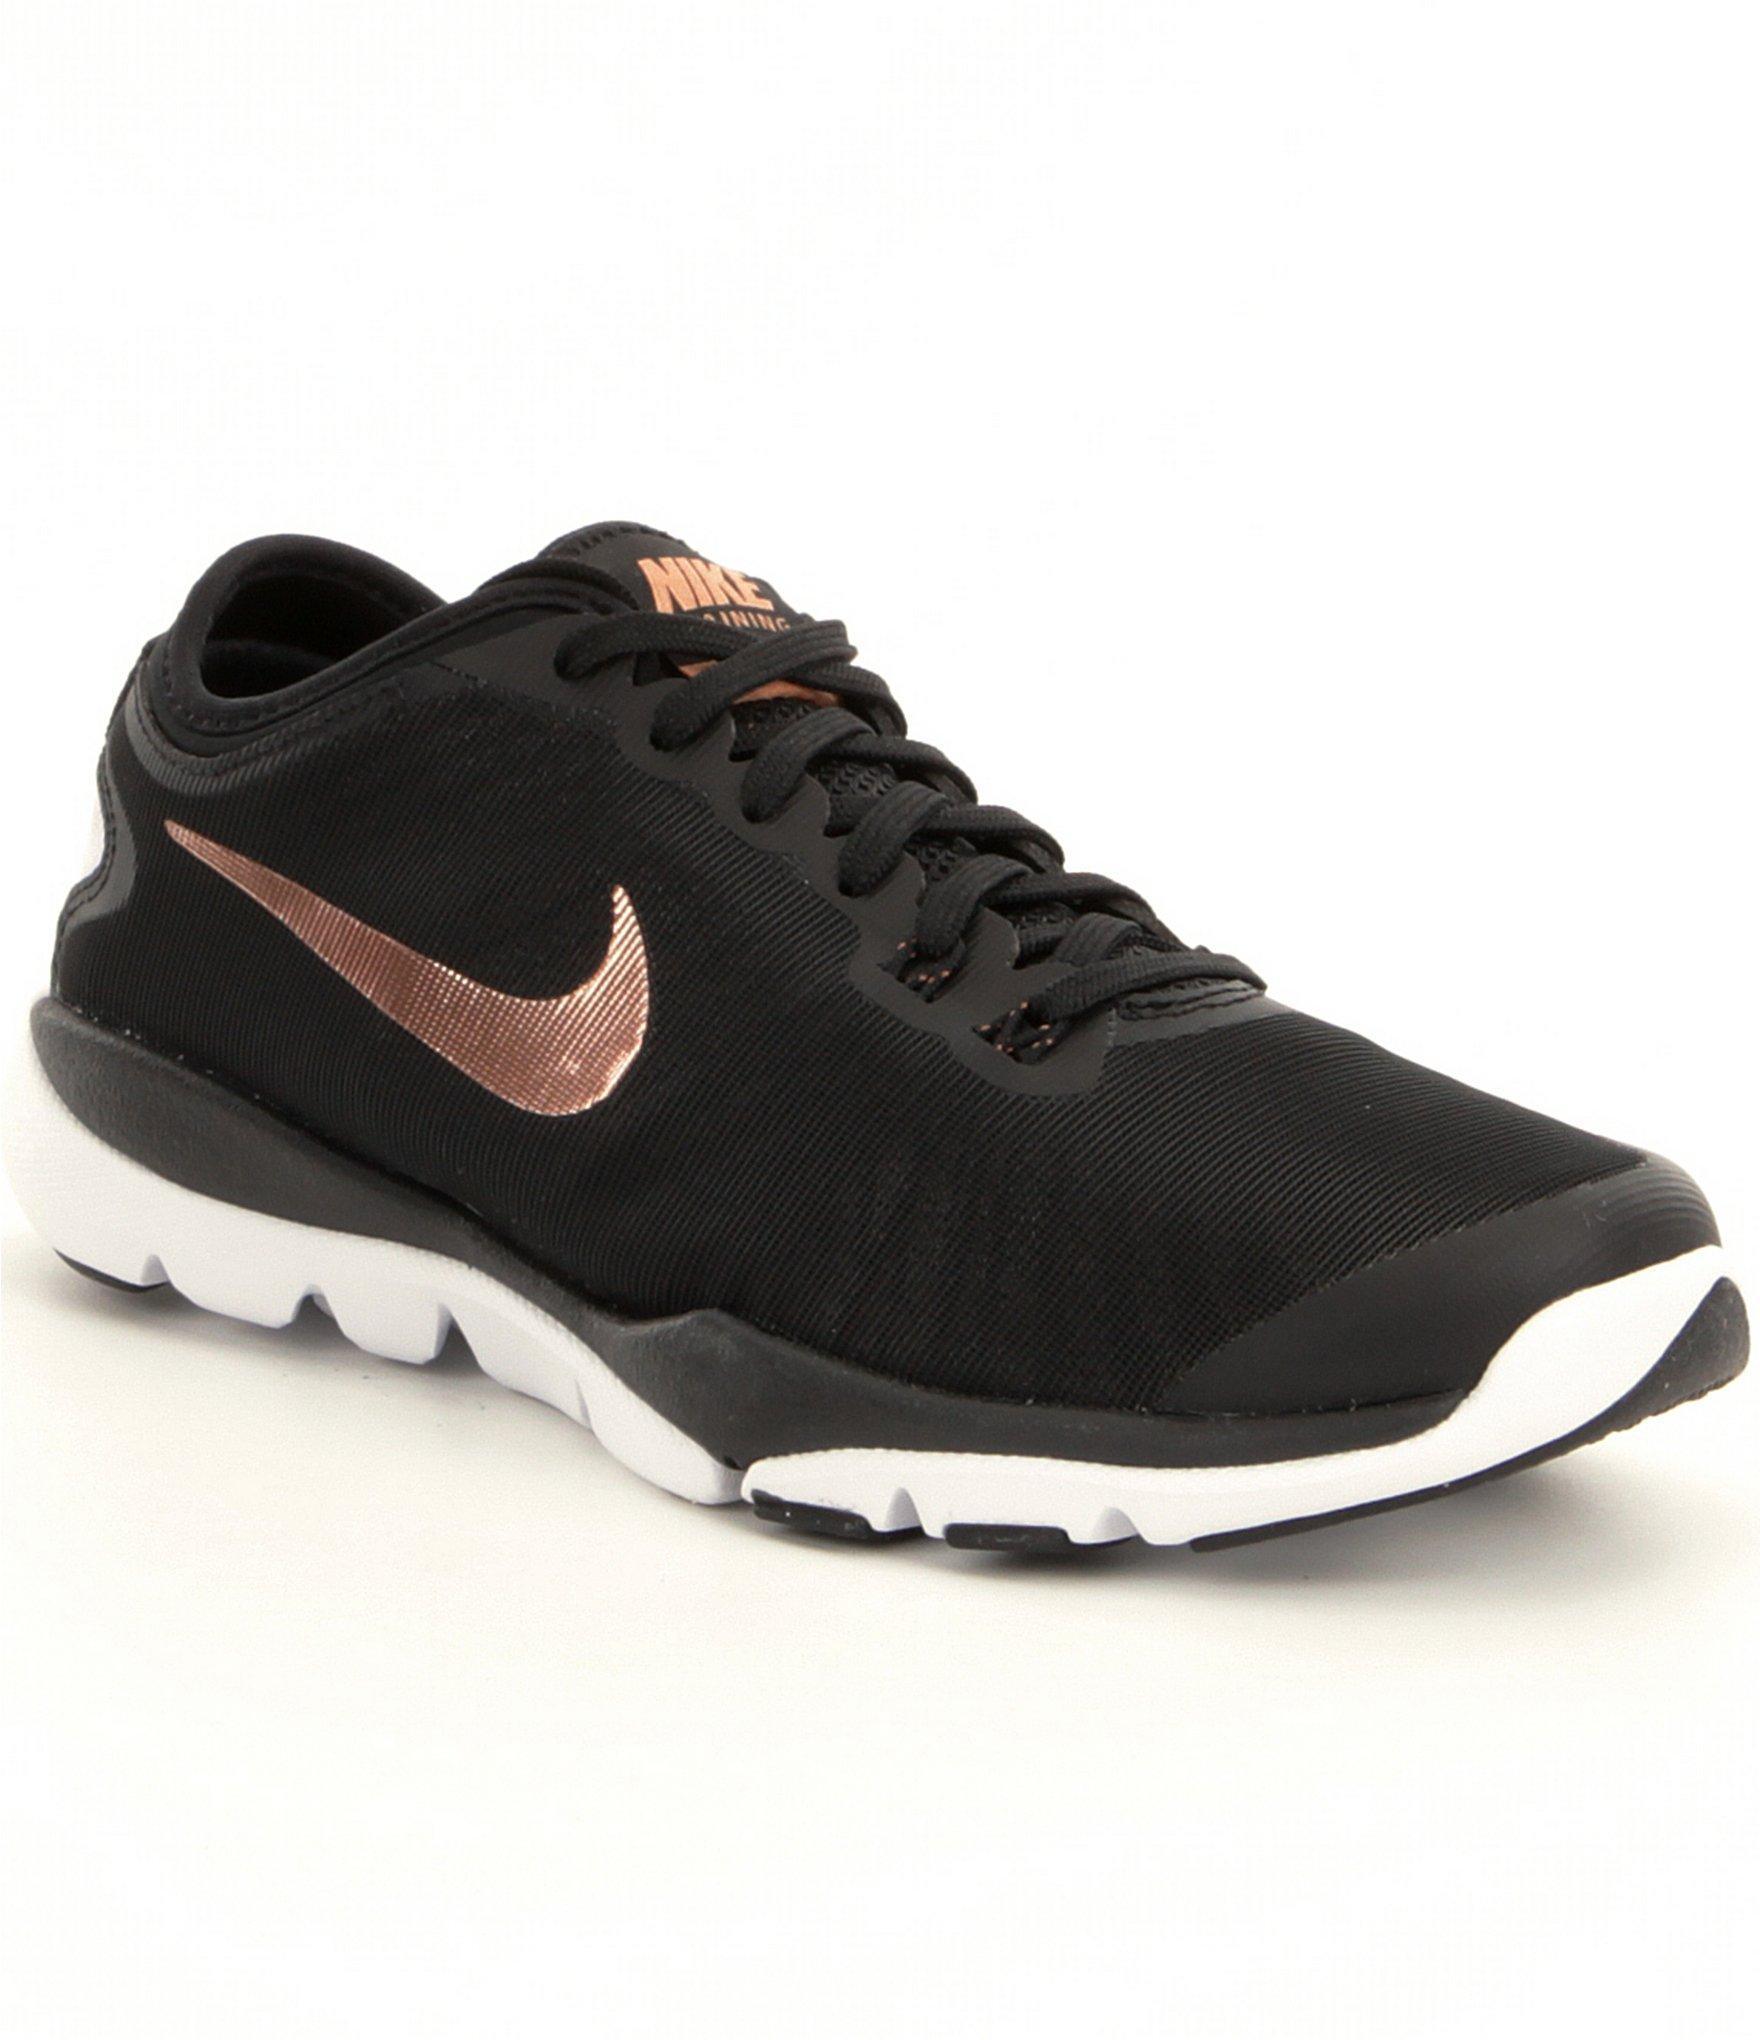 c050c1980c7877 ... Online For Sale at Hotblogornot ... where  Lyst - Nike Women´s Flex  Supreme Tr 4 Training Shoes in Black uk store ...